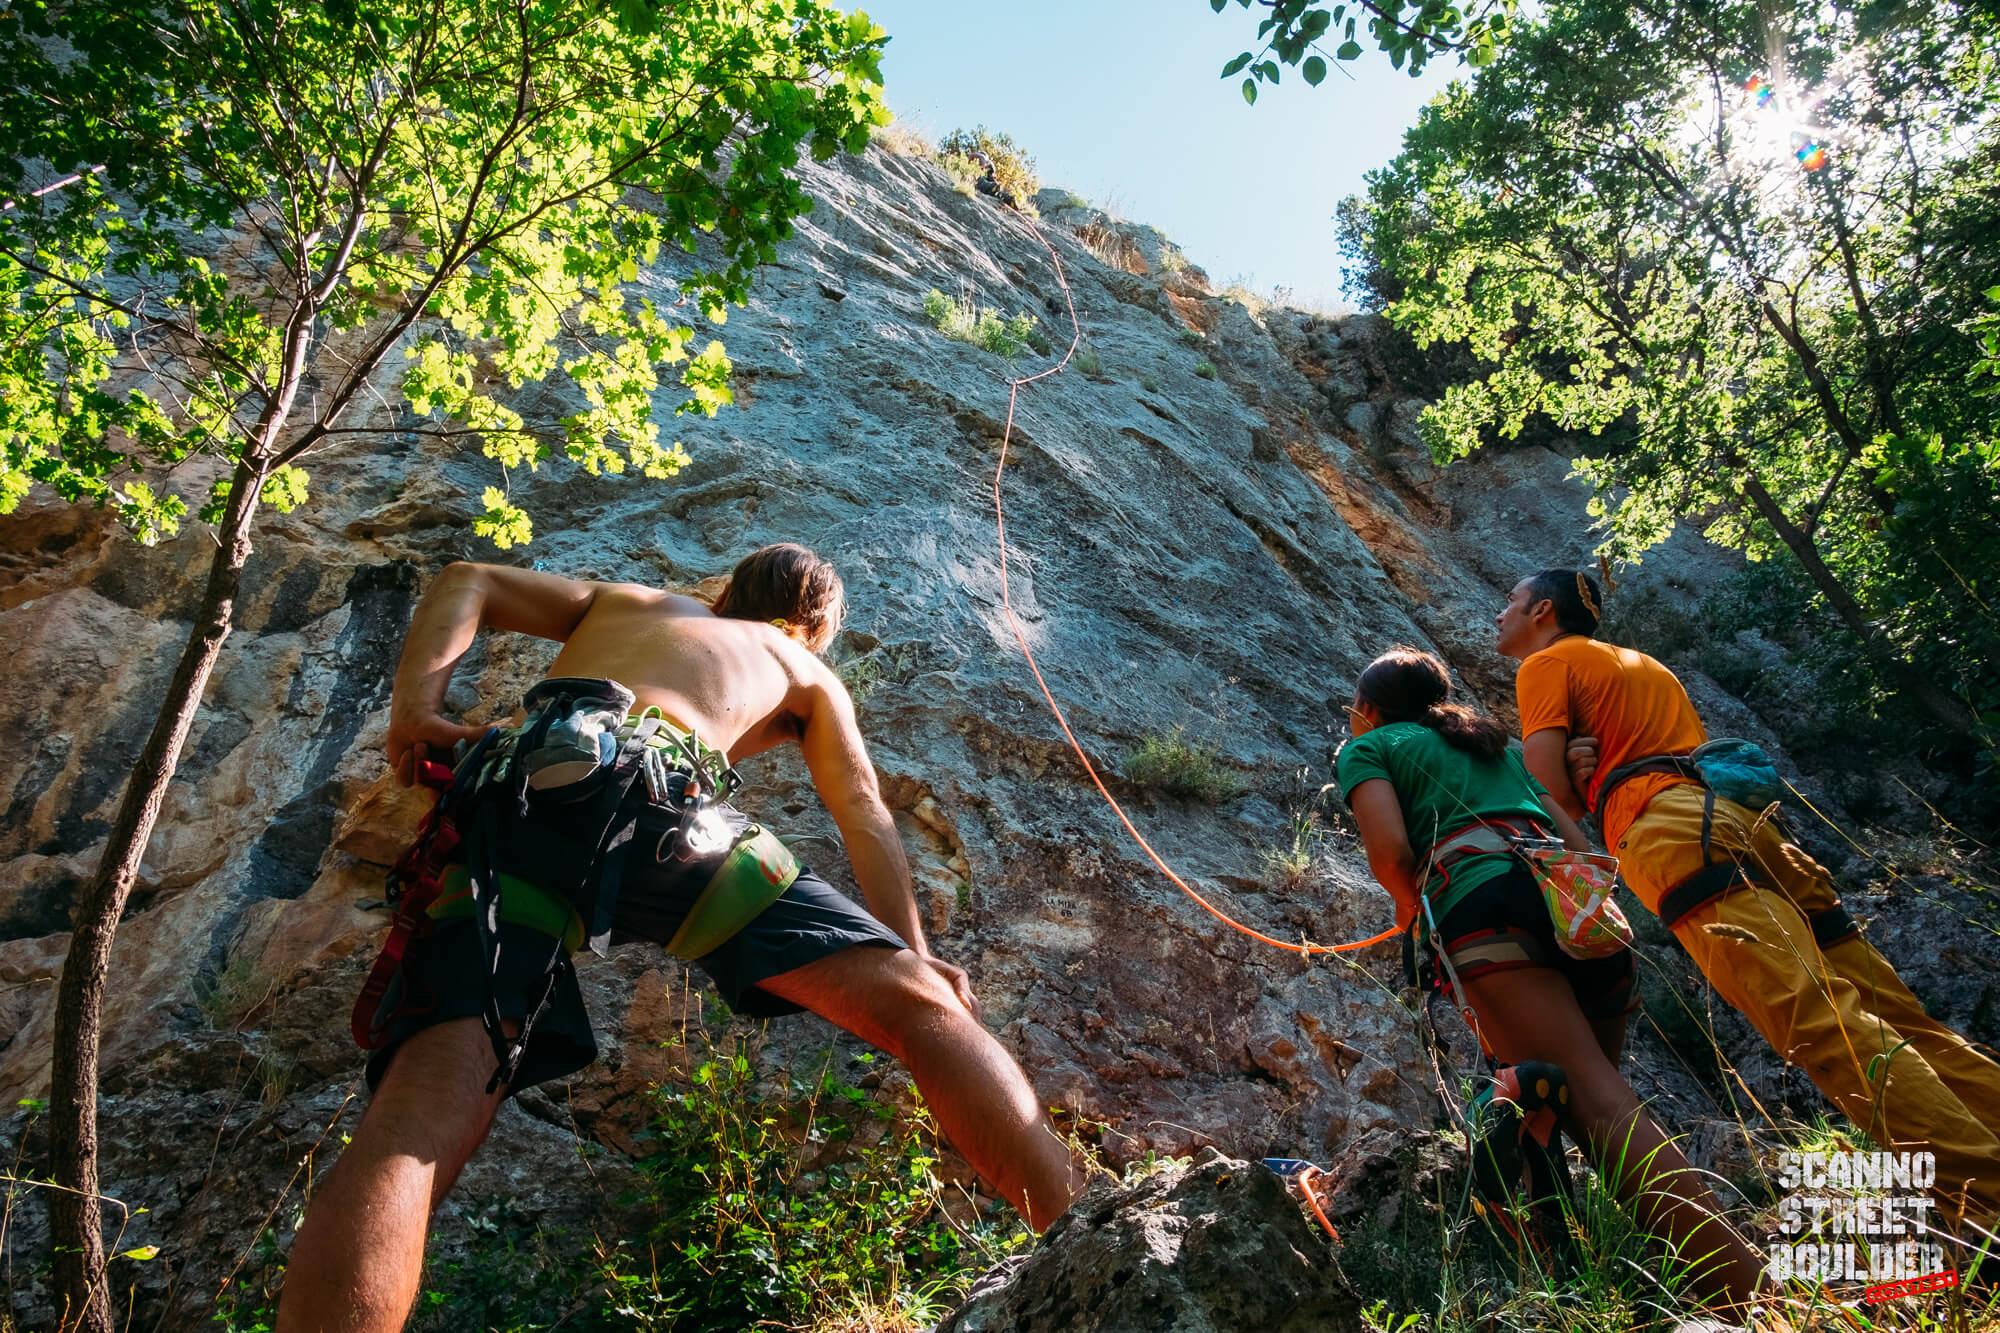 climbing-scanno